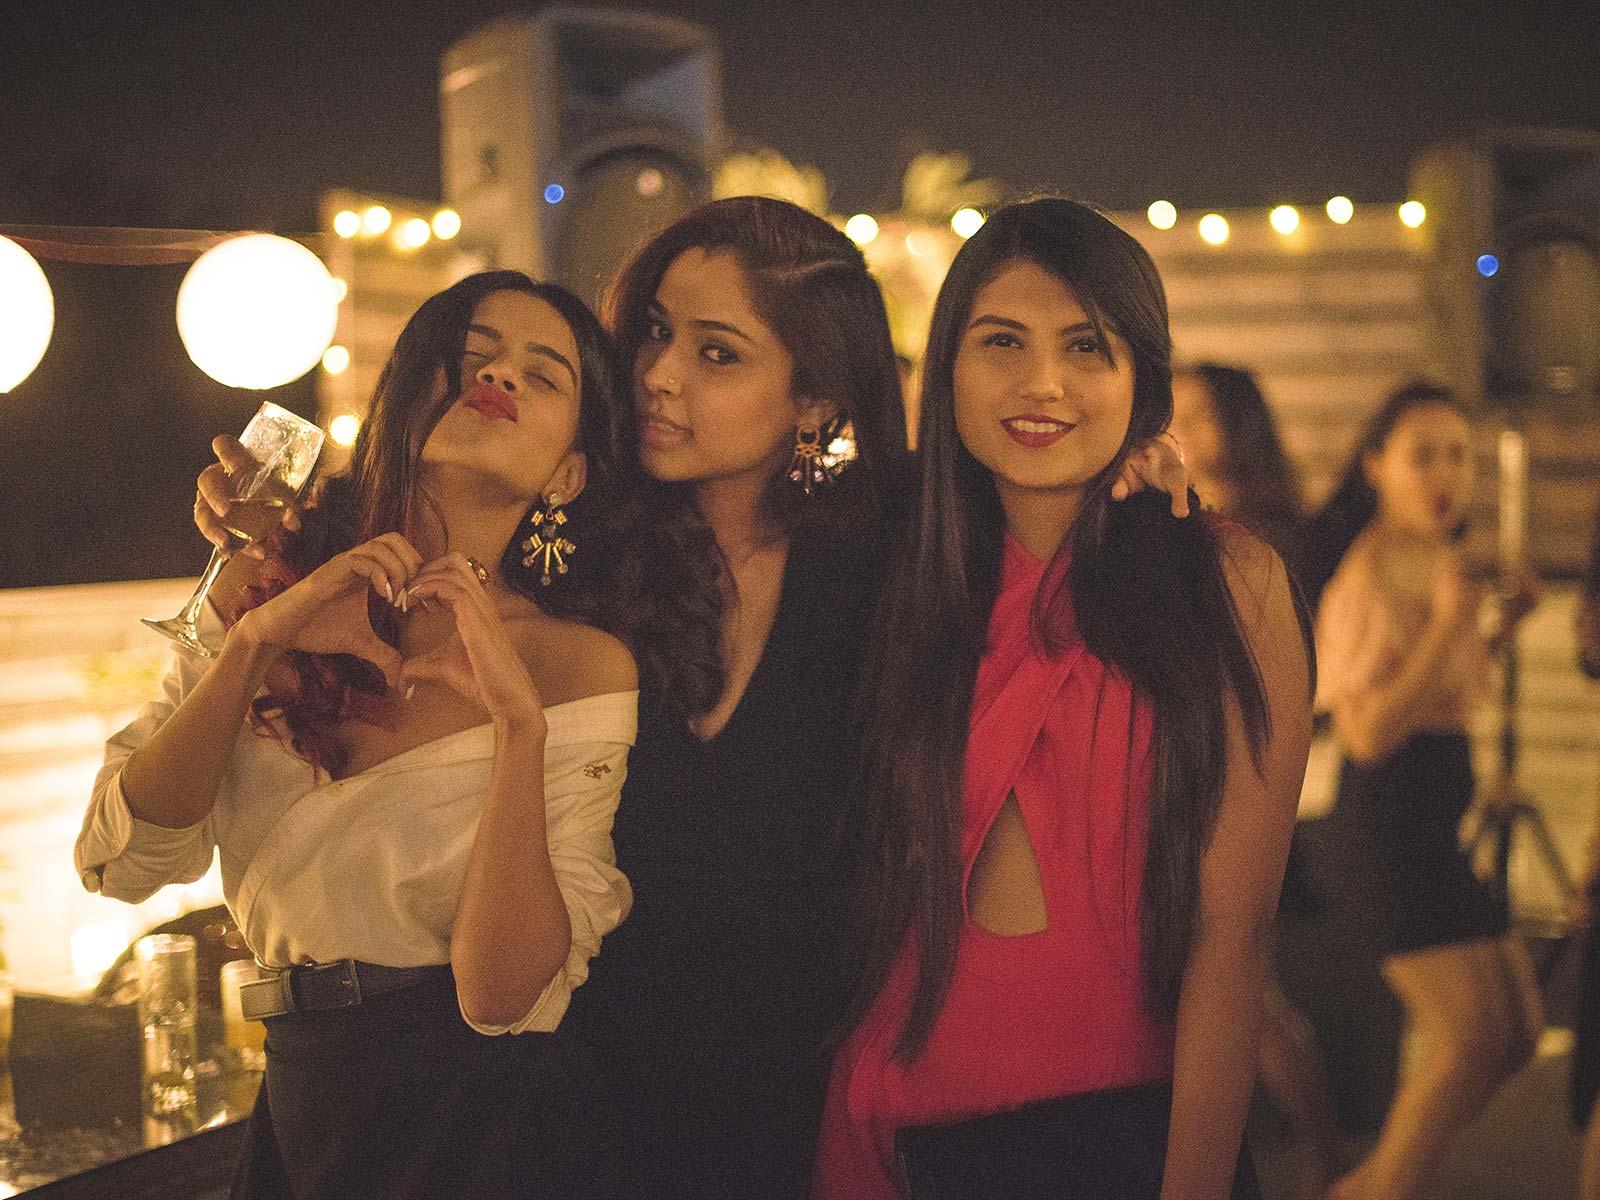 Komal Pandey, Gayatri Chehhetry and Cherry Jain at the #POPxoTurns3 party